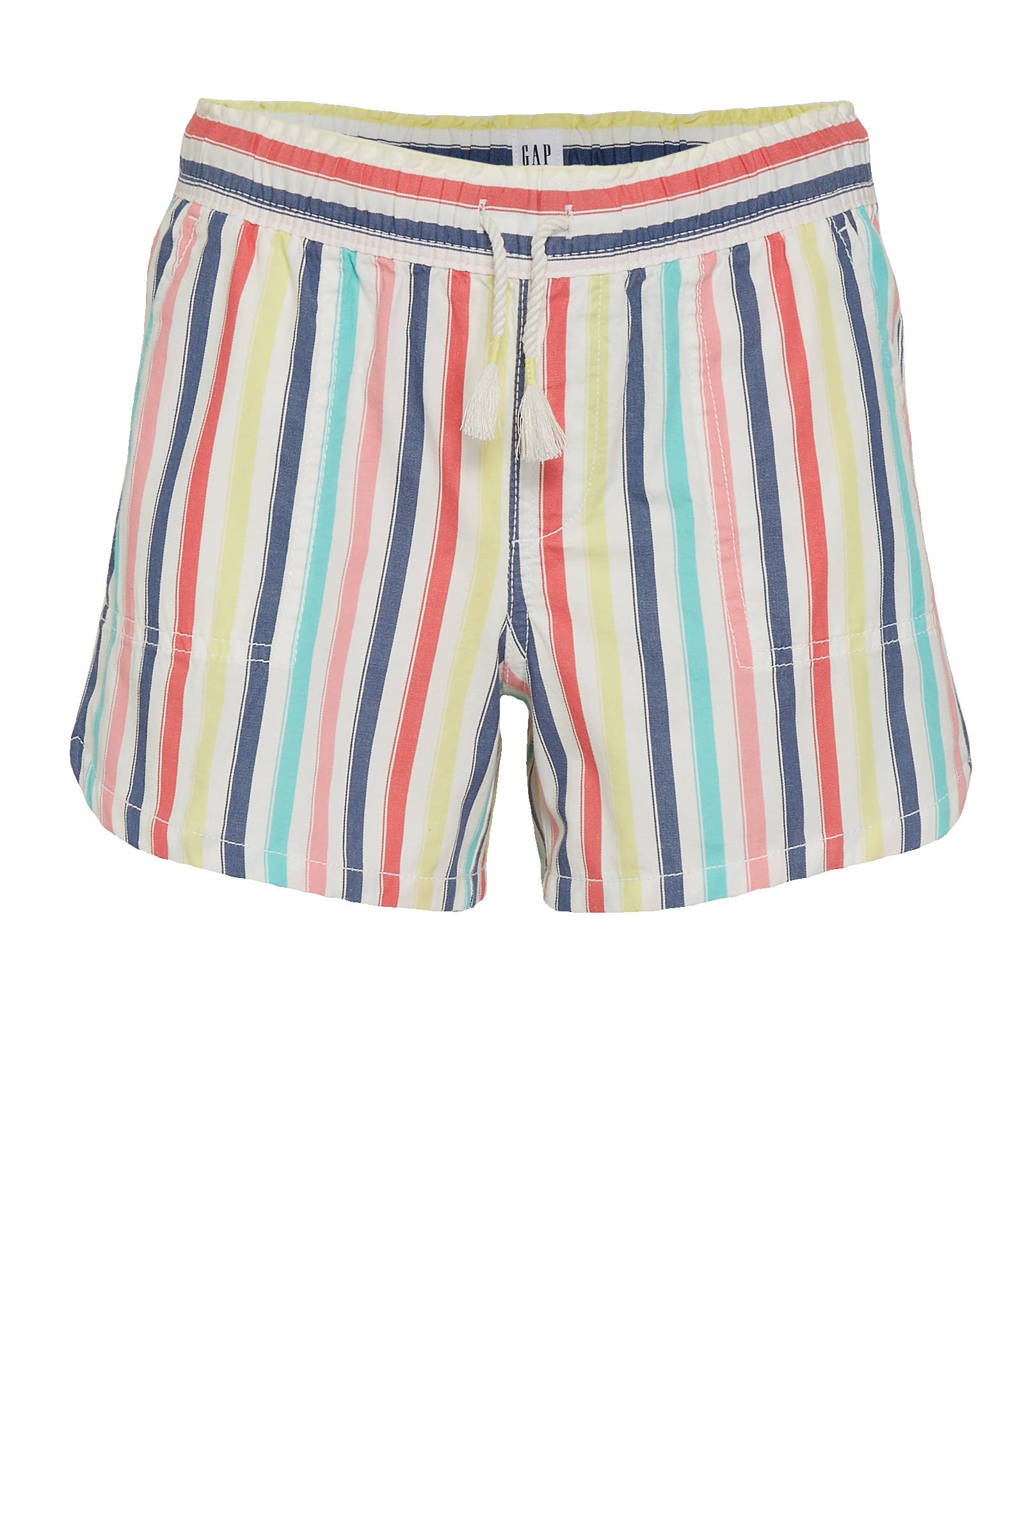 GAP gestreepte regular fit short rood/roze/geel/blauw/wit, Rood/roze/geel/blauw/wit